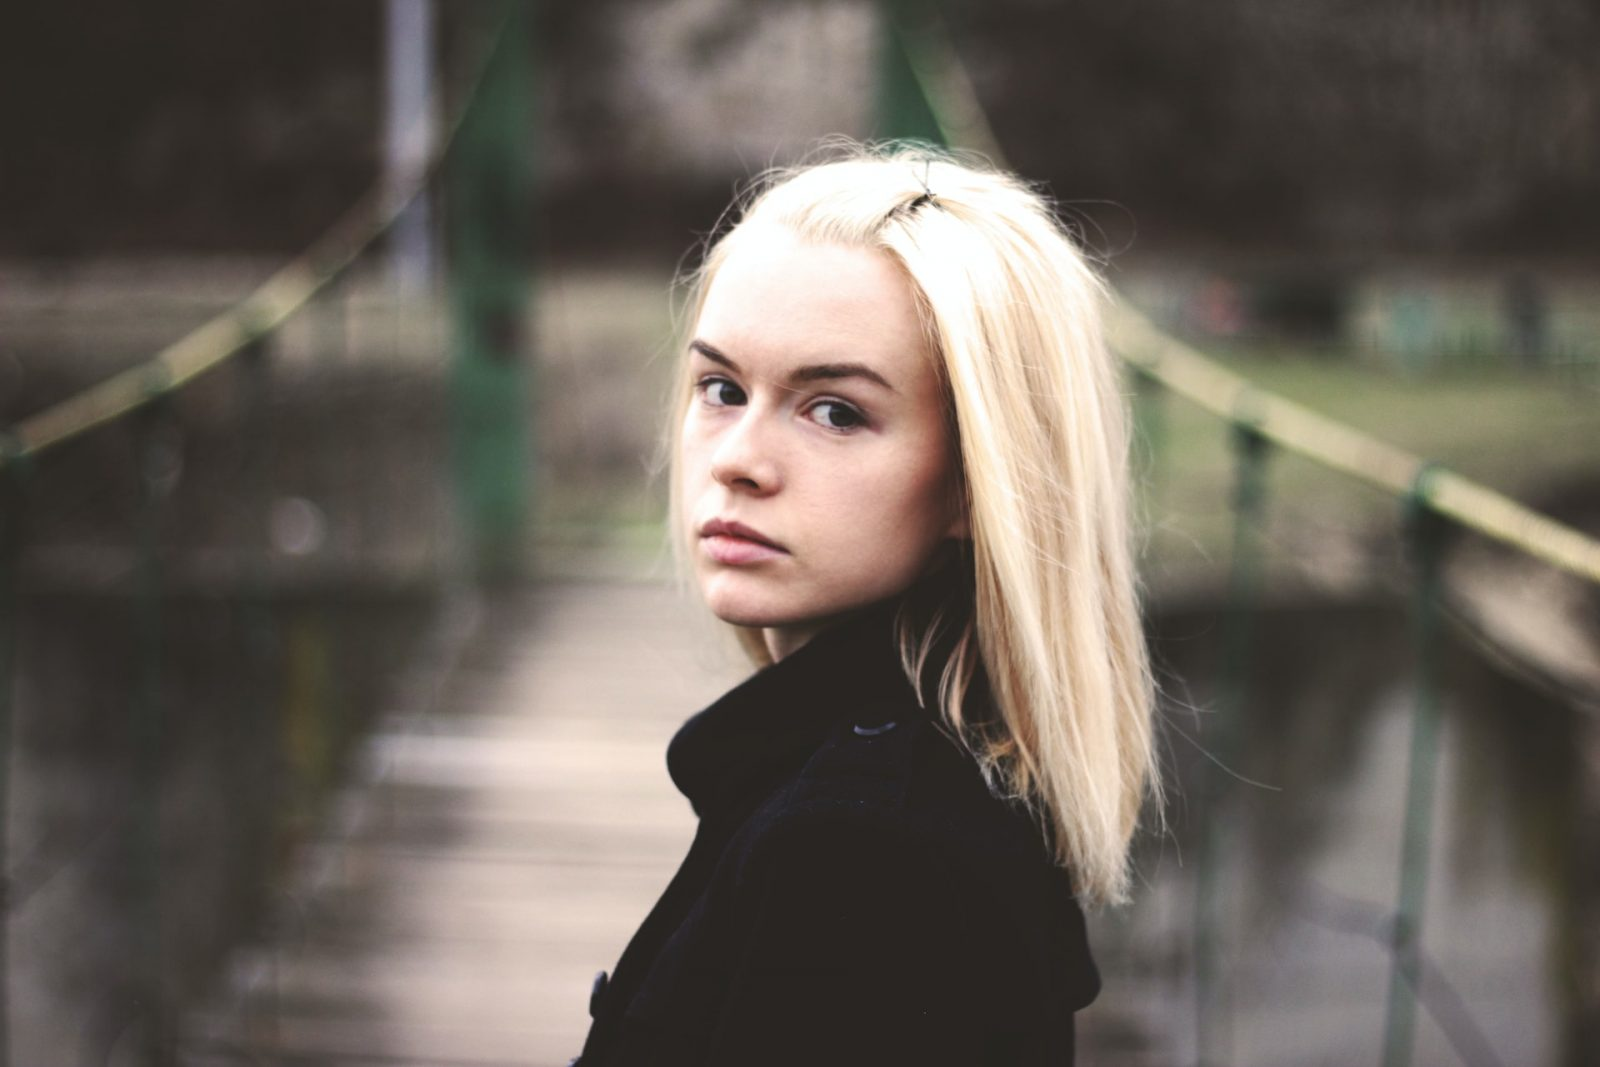 blonde pensive woman